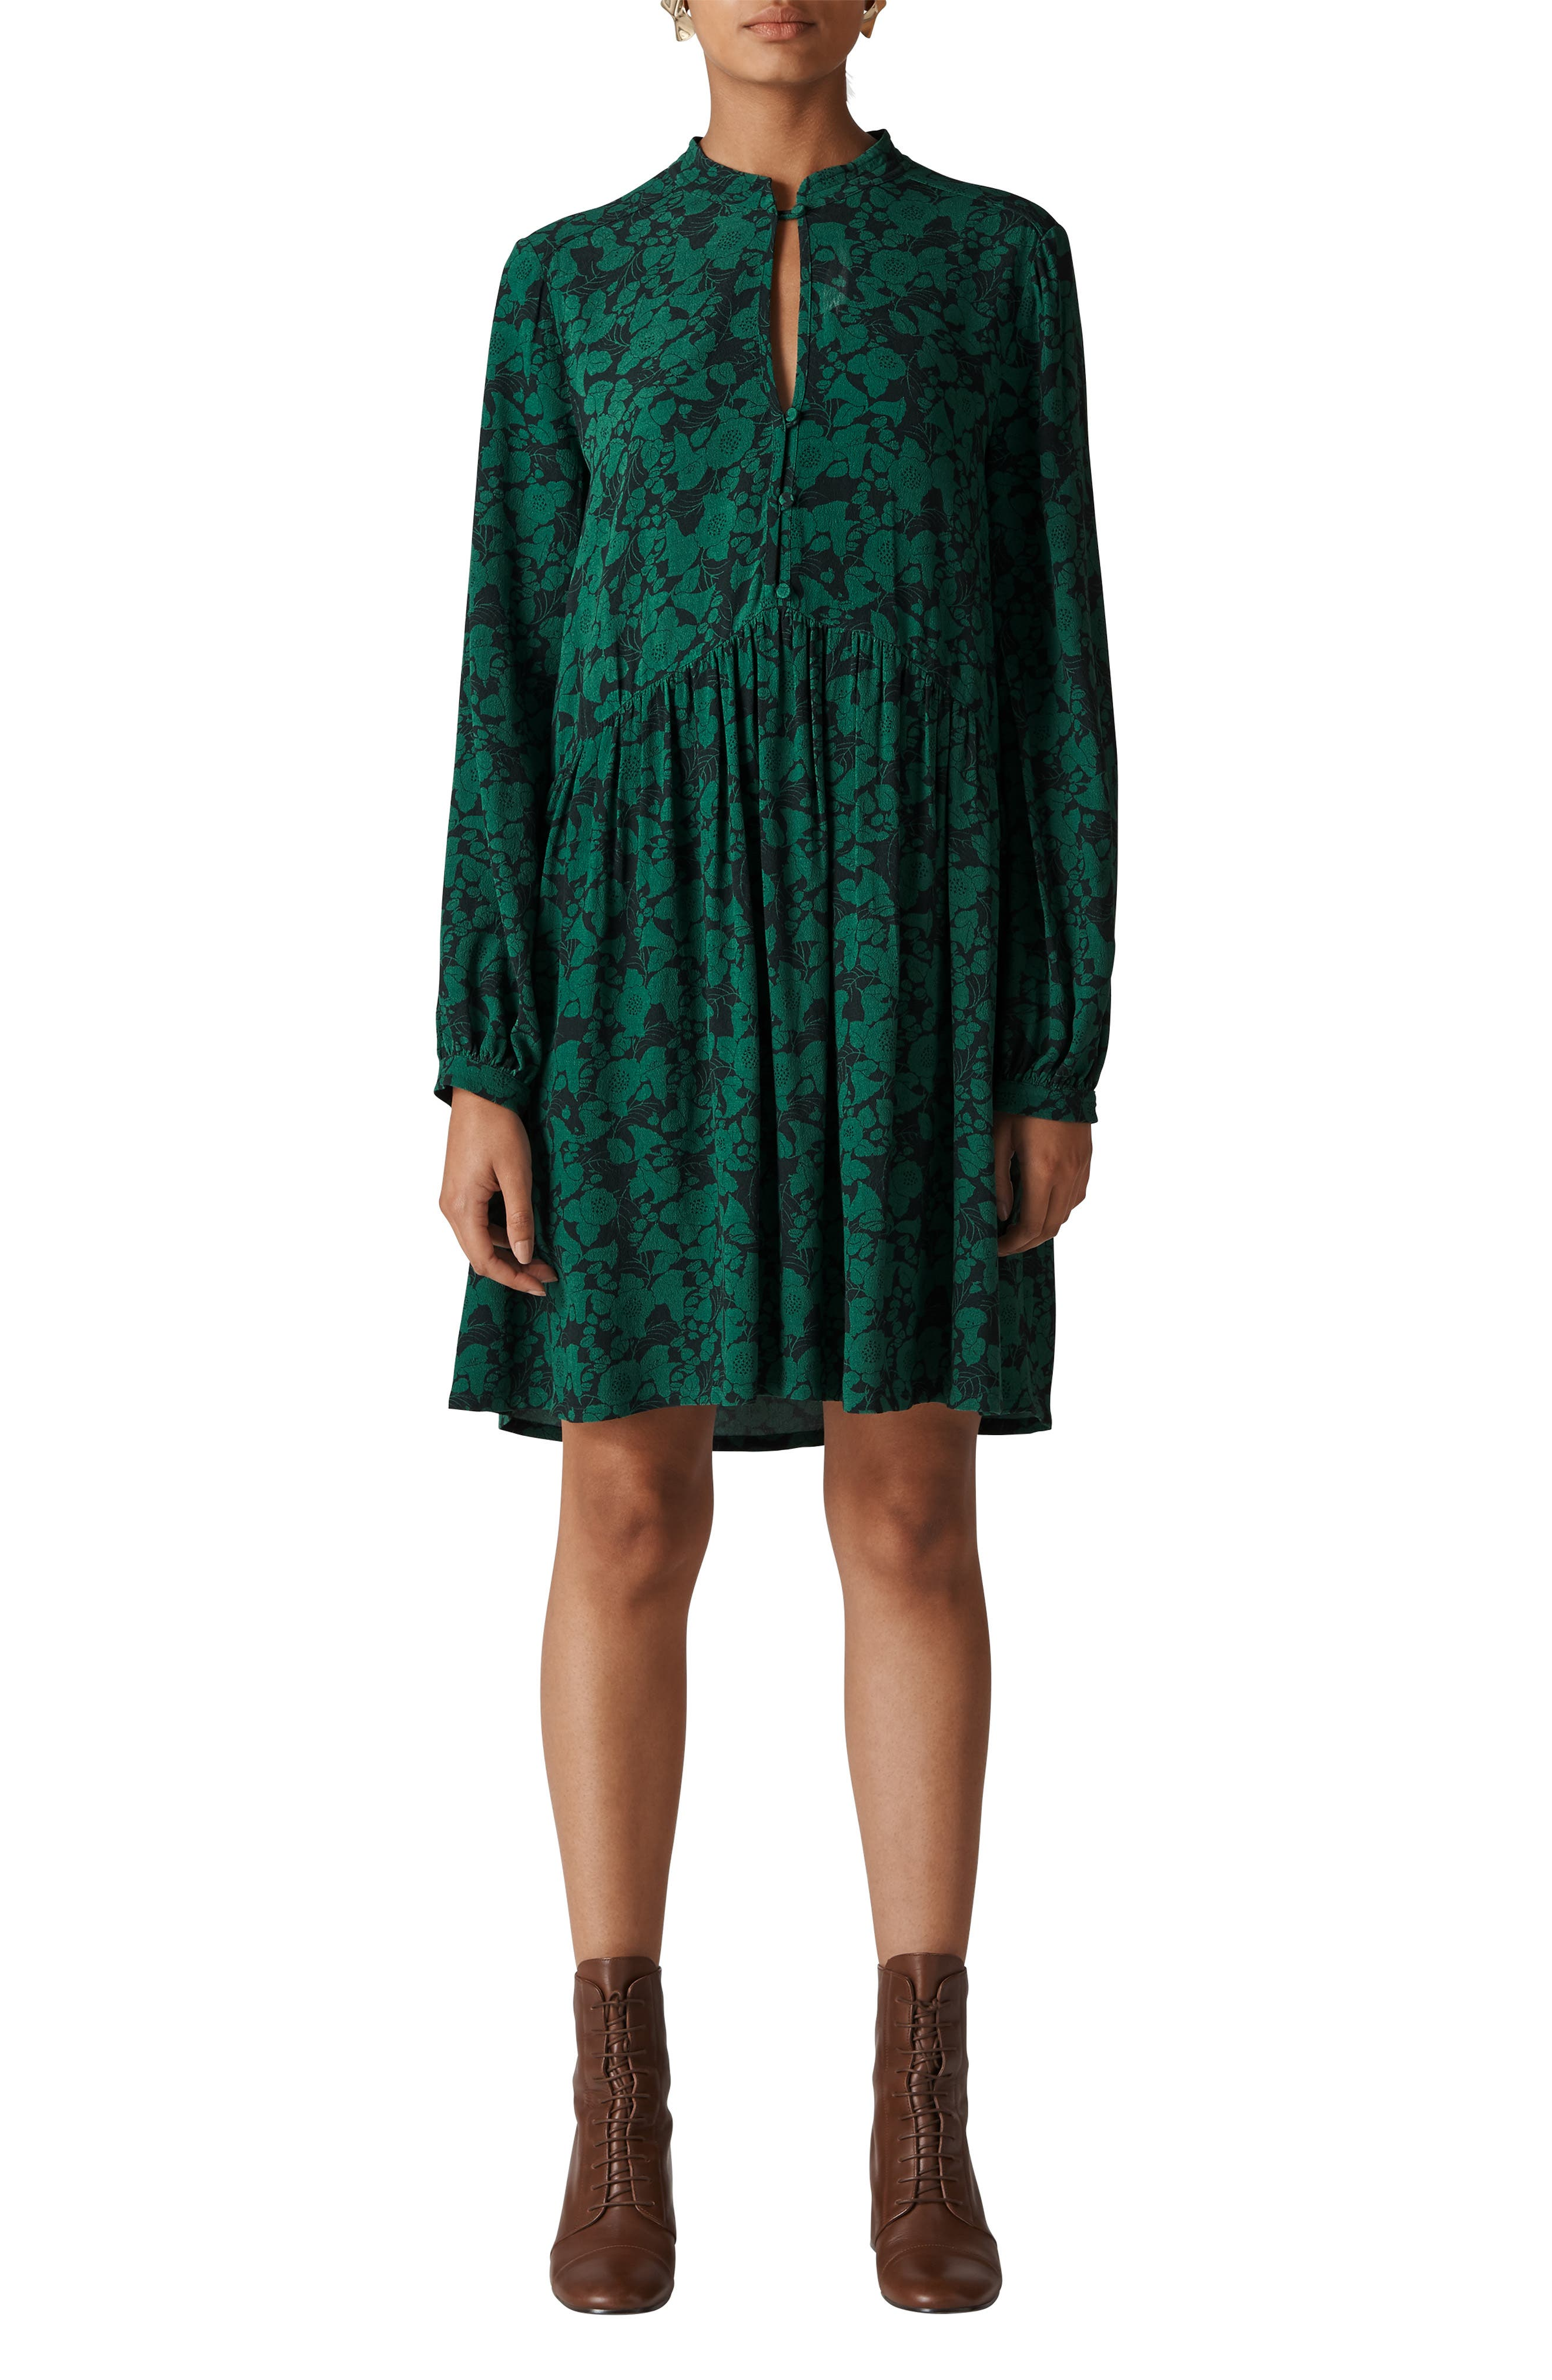 Deco Floral Print Shirtdress,                             Main thumbnail 1, color,                             GREEN/ MULTI